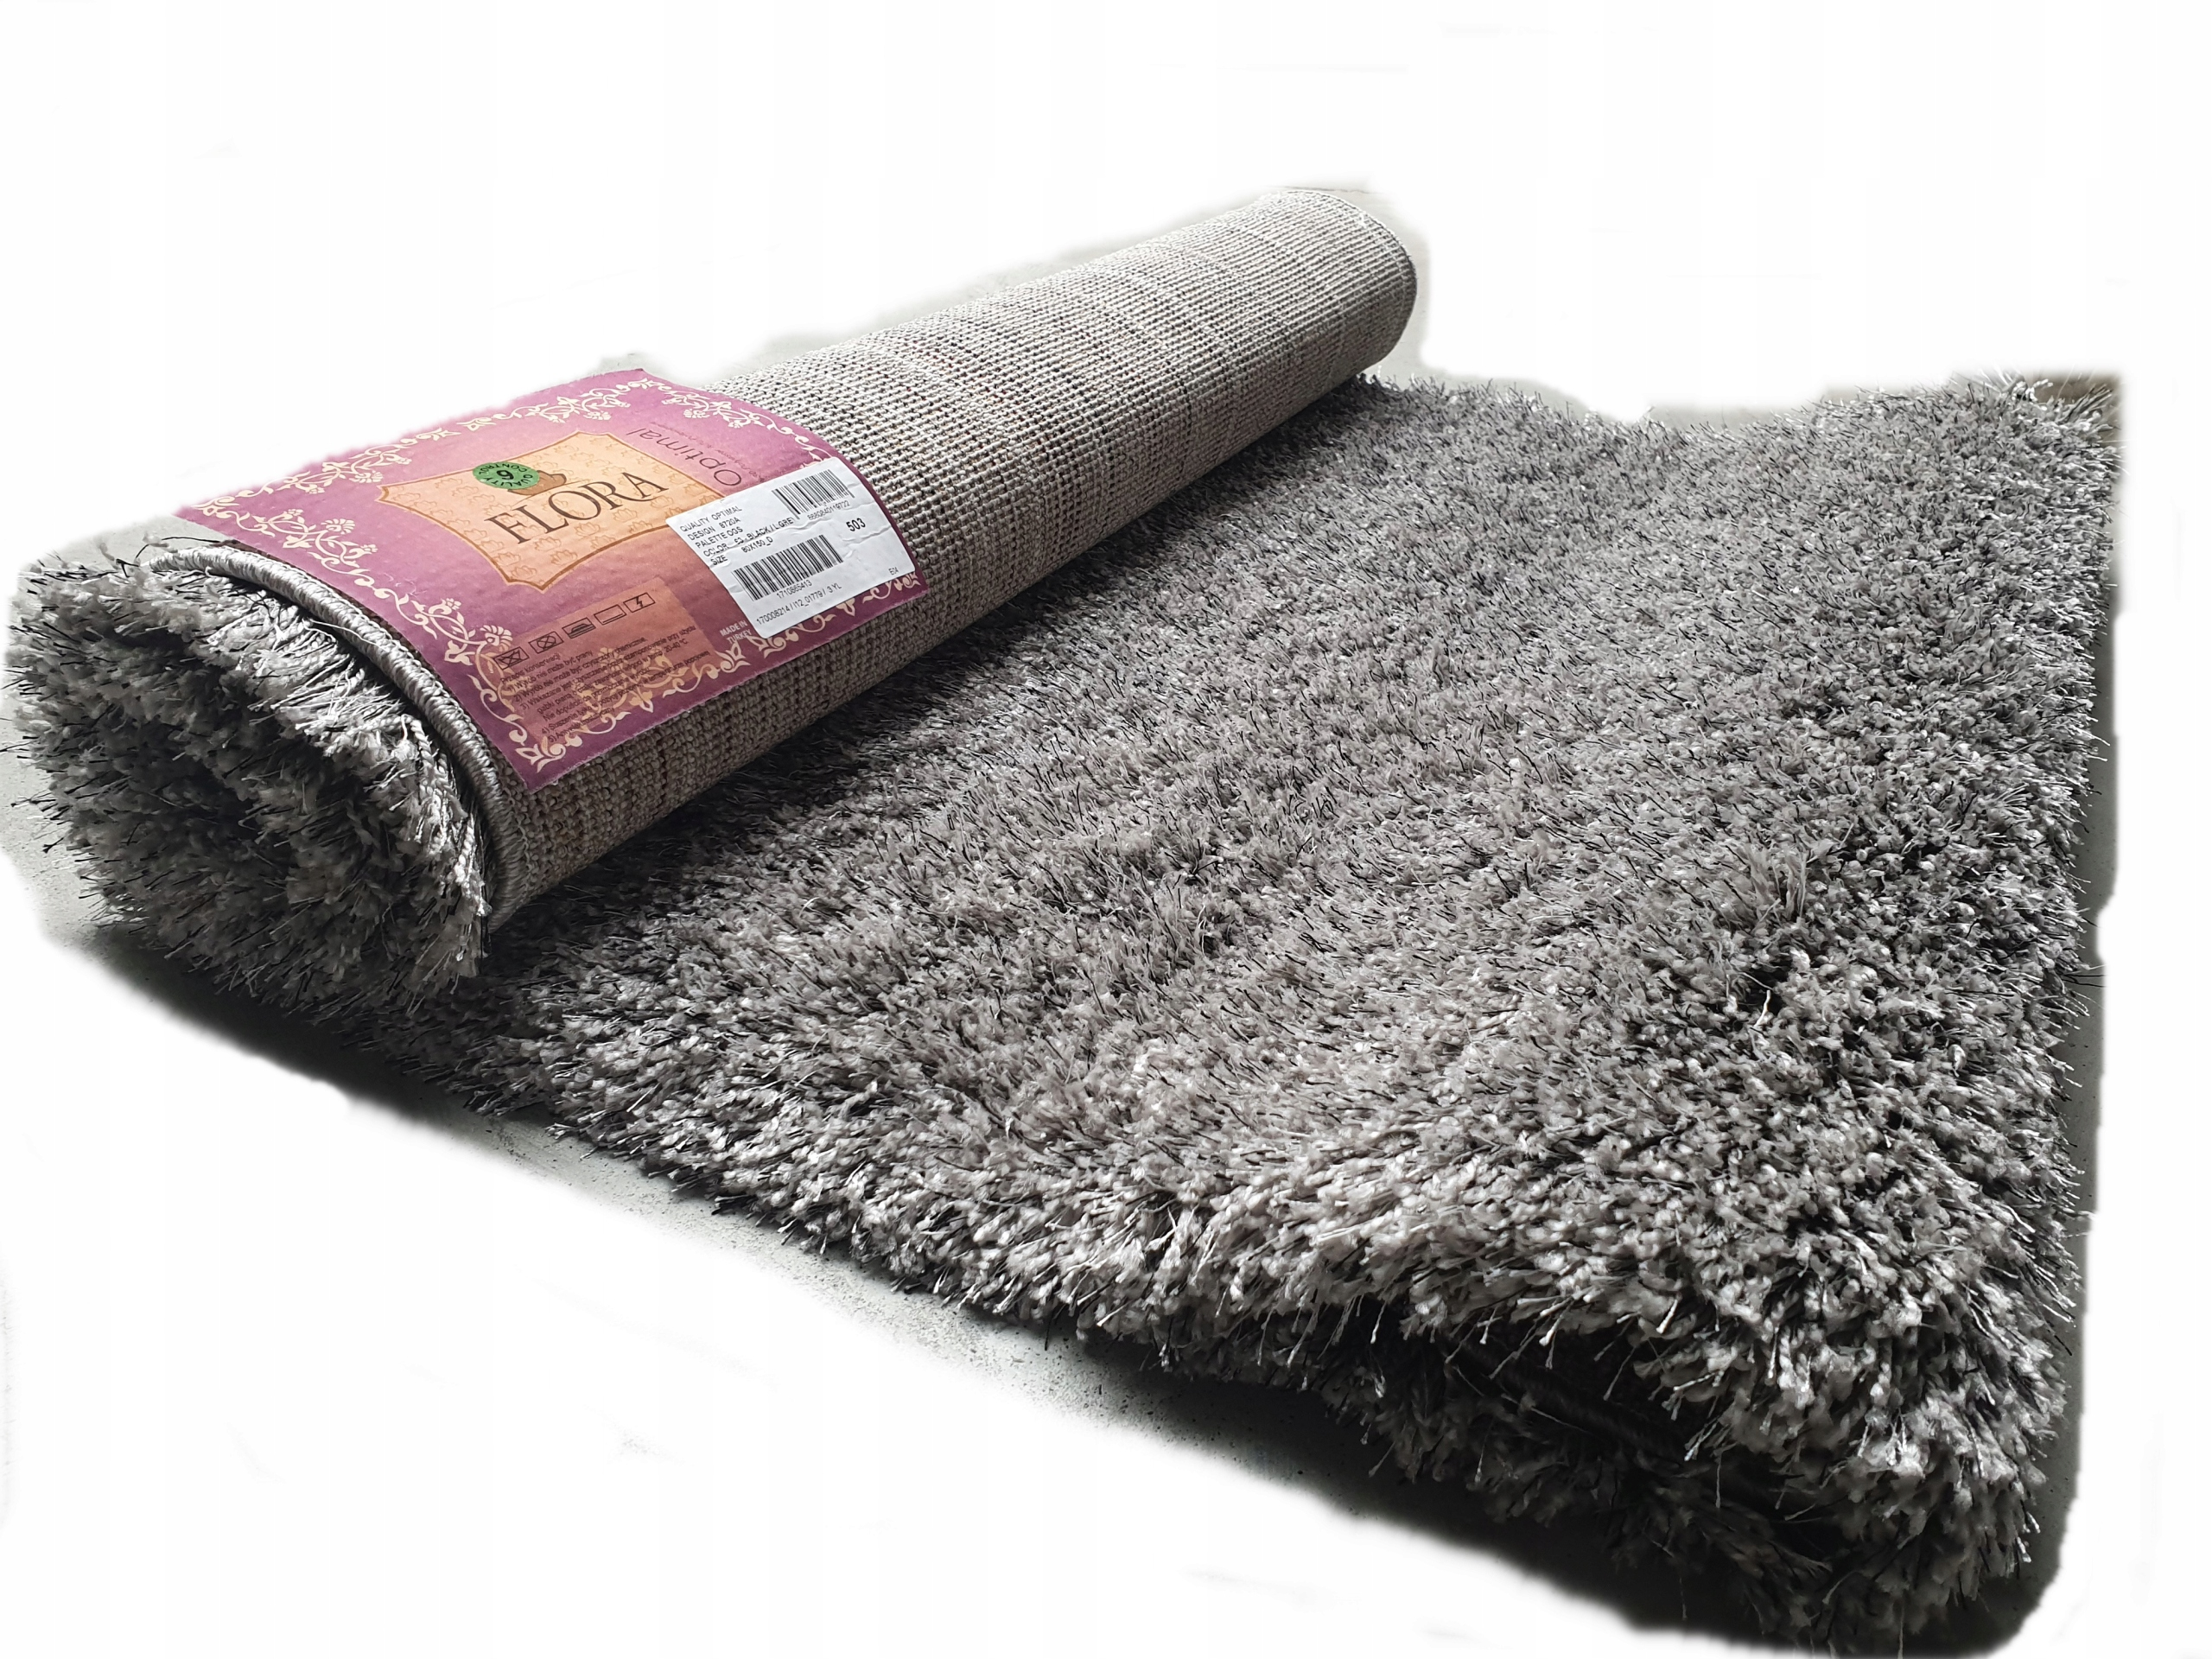 Koberce Izbov Karpet 250x350 Bcf Super Quality 10 Farieb Shaggy 200x300 Flry Polyester Empty